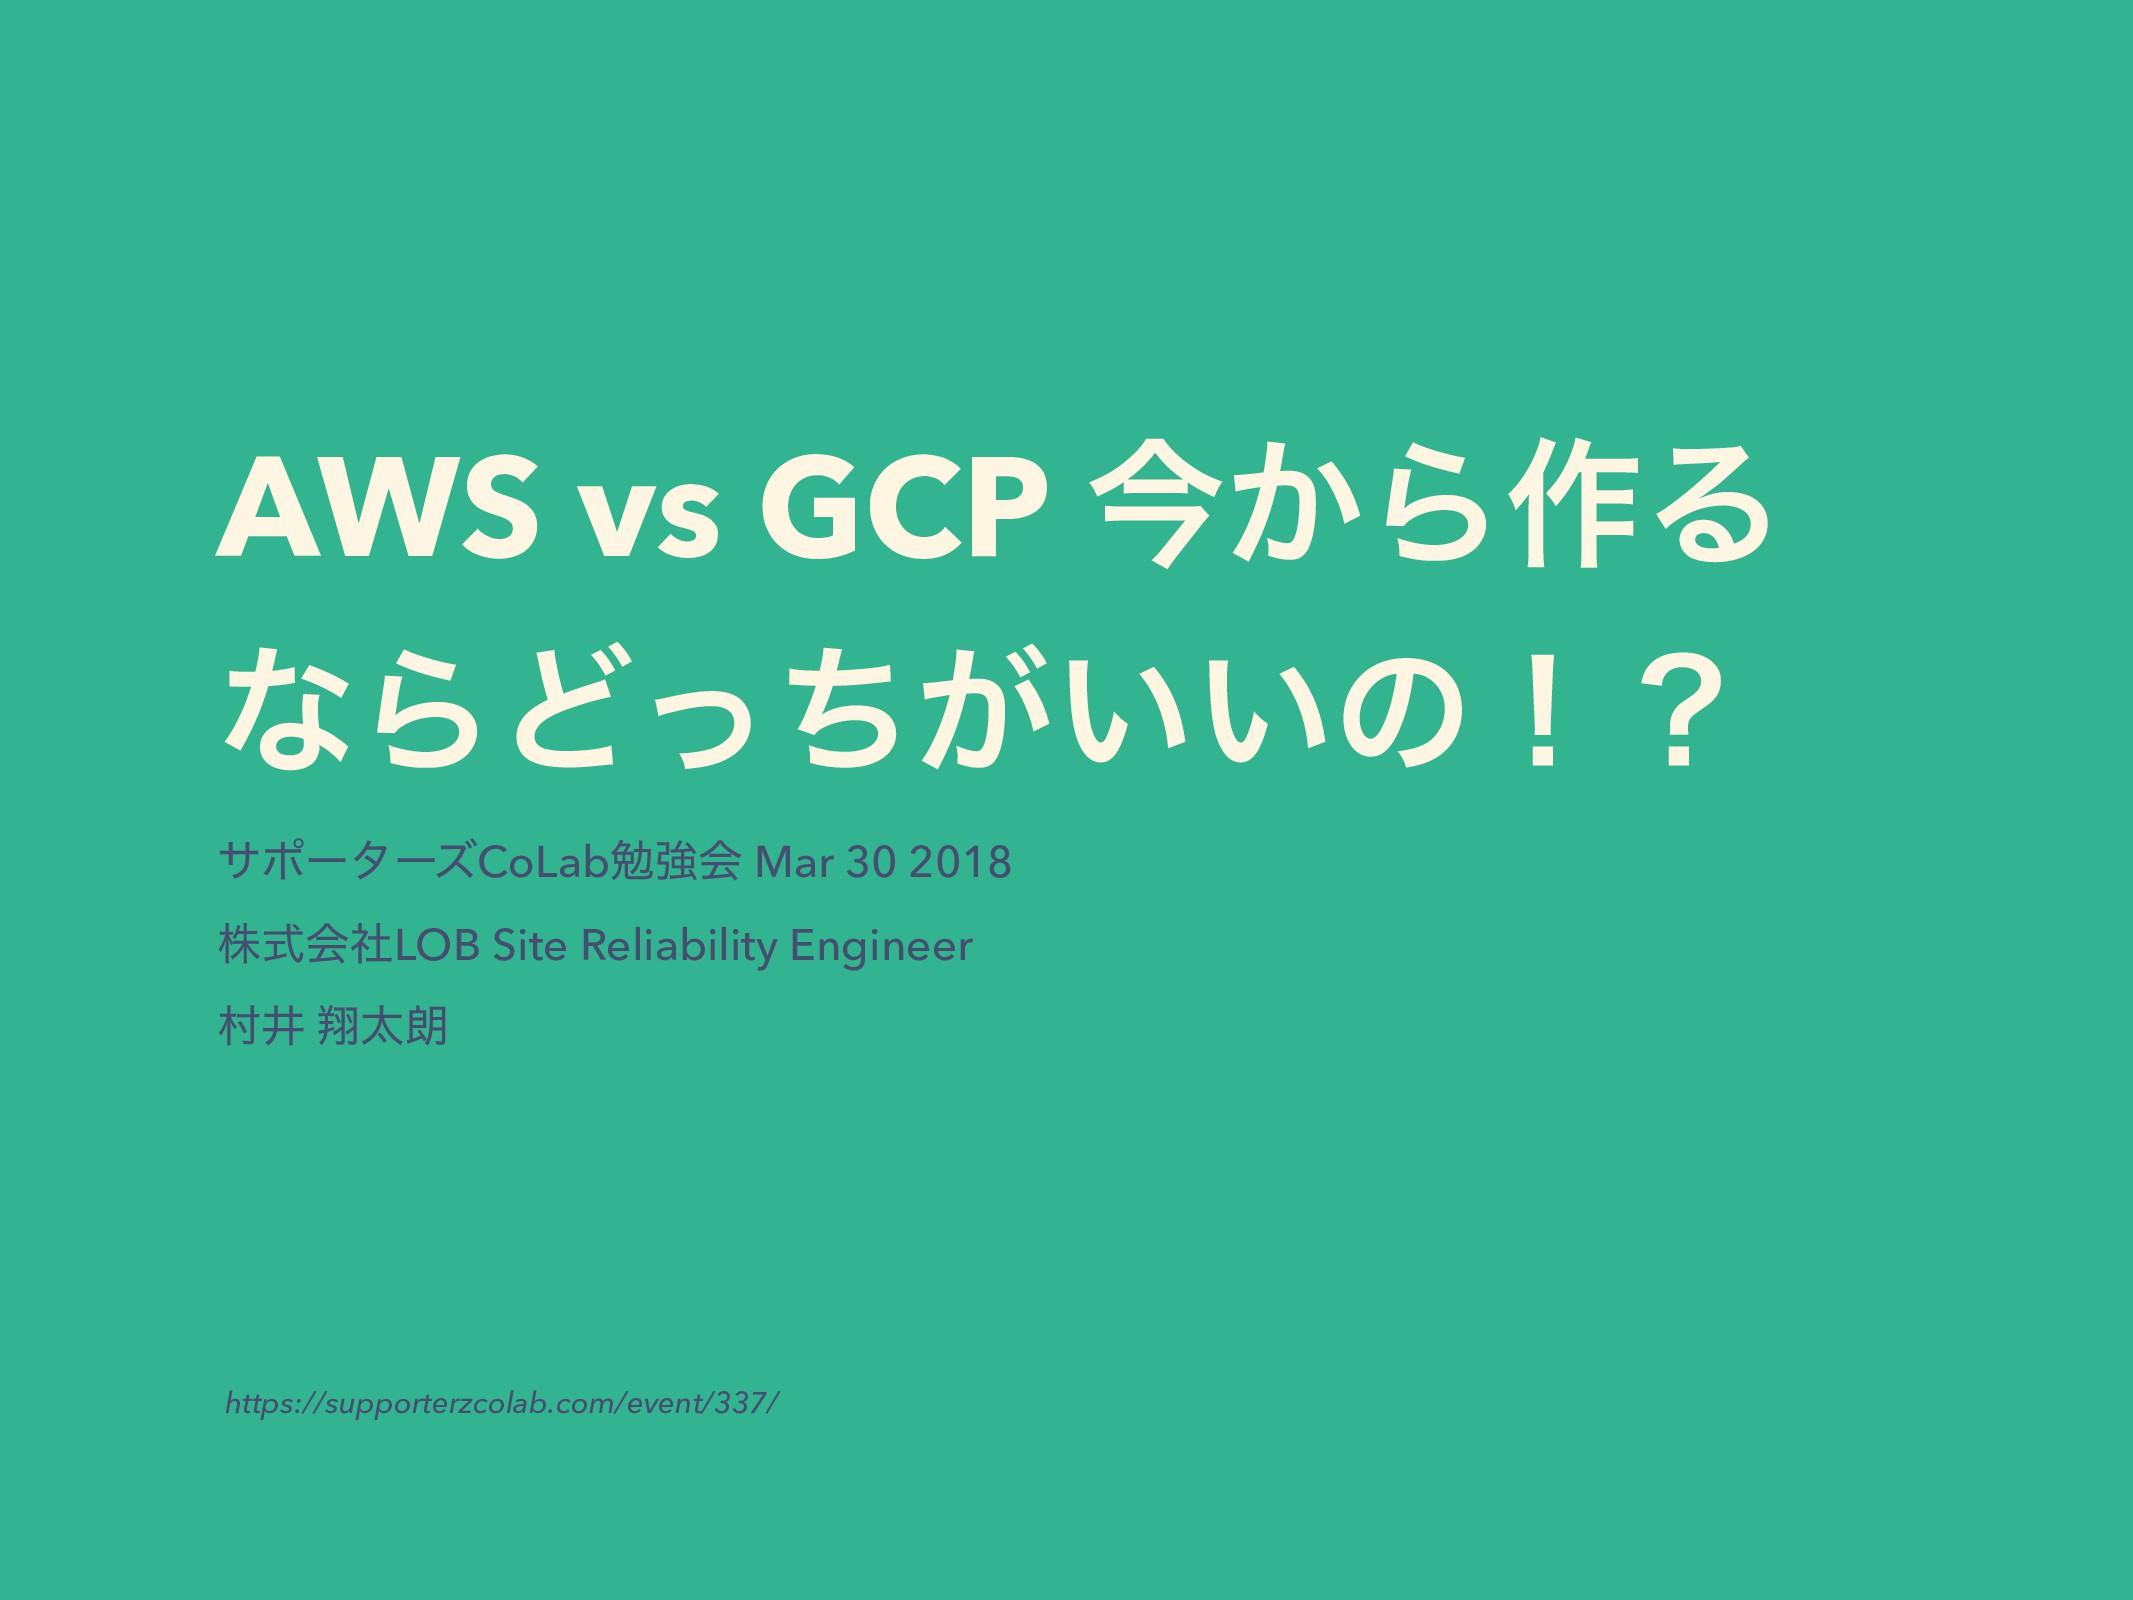 AWS vs GCP ࠓ͔Β࡞Δ ͳΒͲ͕͍͍ͬͪͷʂʁ αϙʔλʔζCoLabษڧձ Mar...